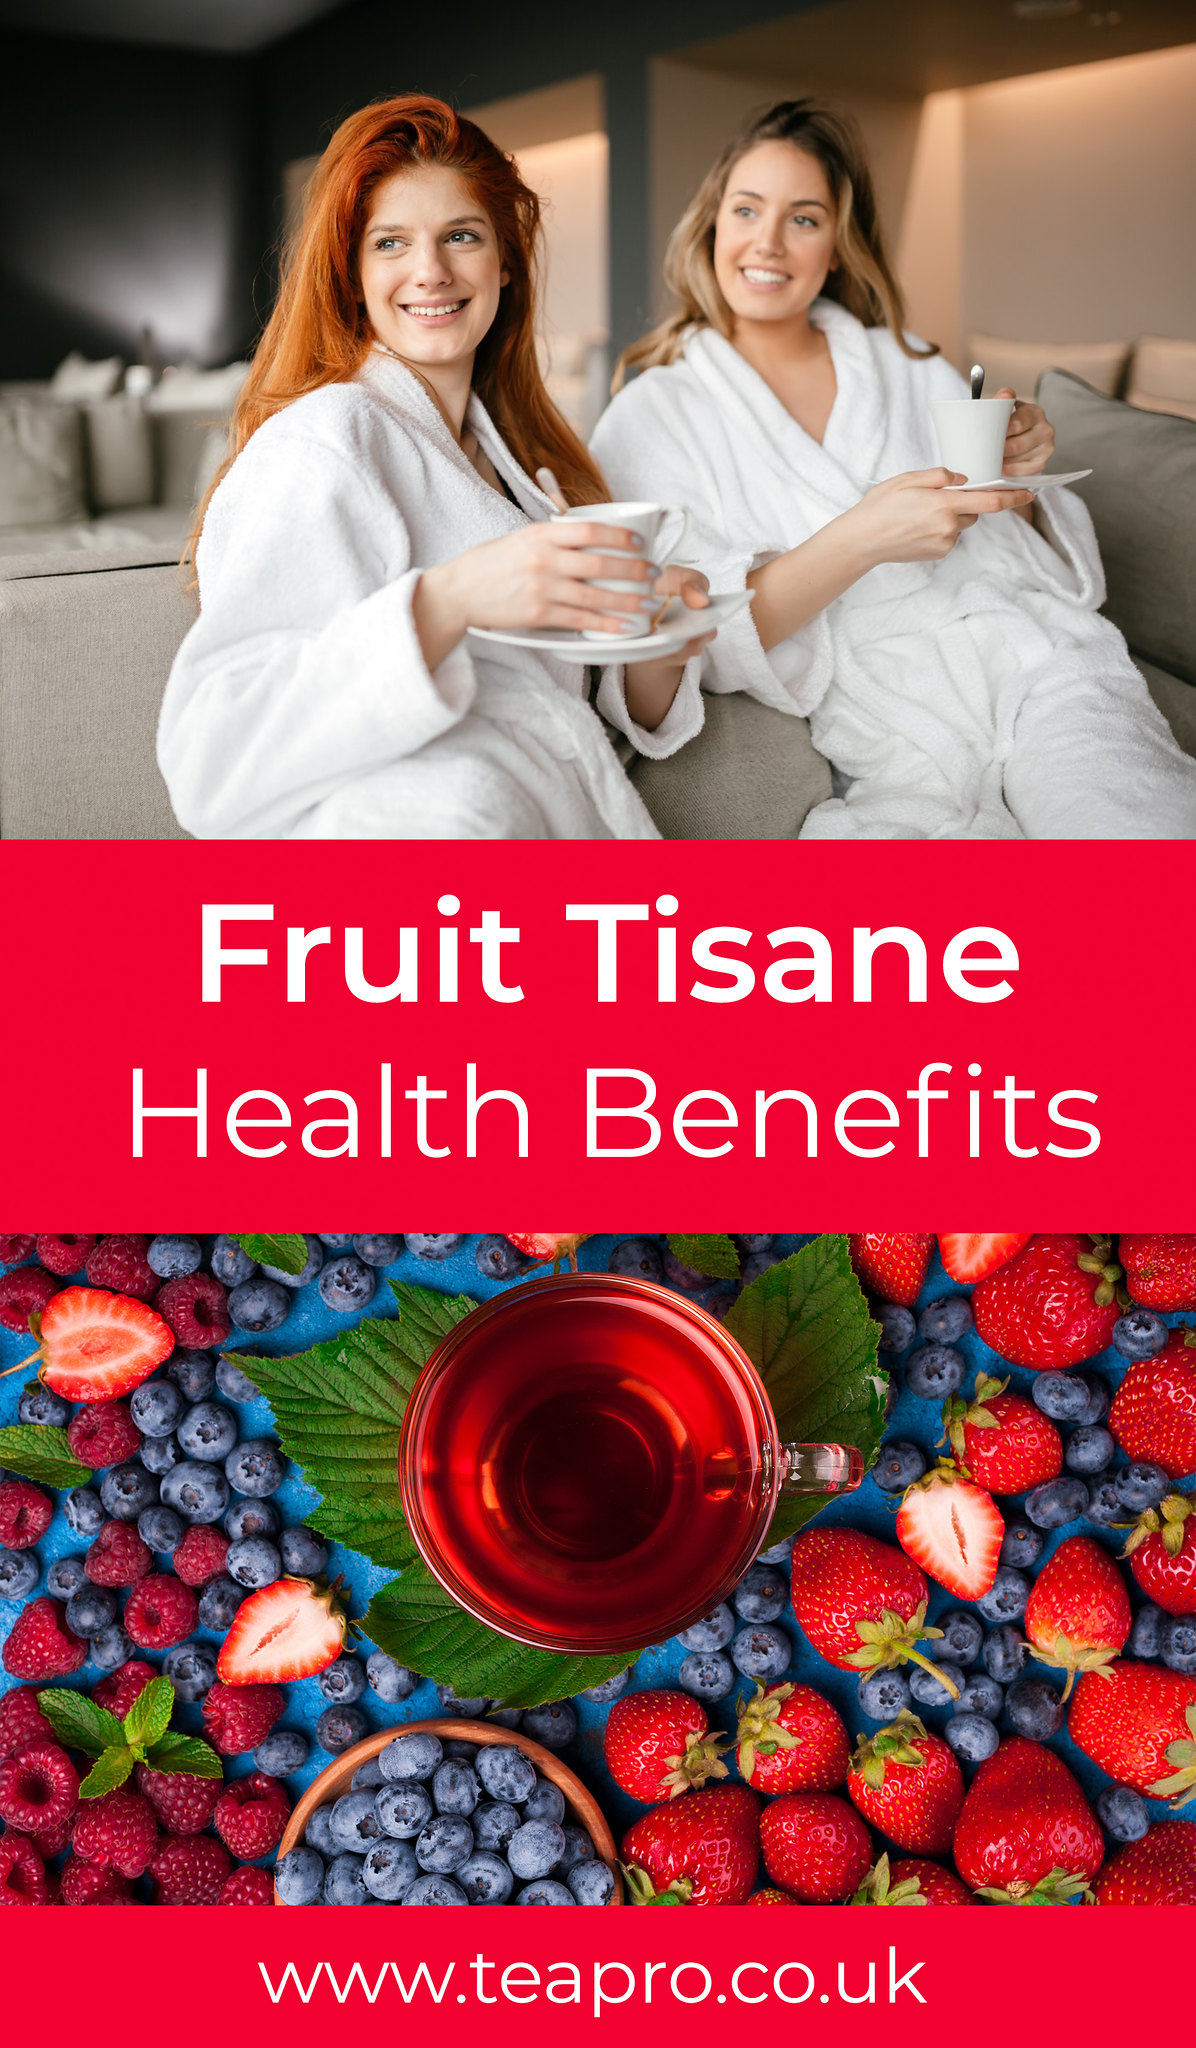 fruit tisane health benefits - Teapro